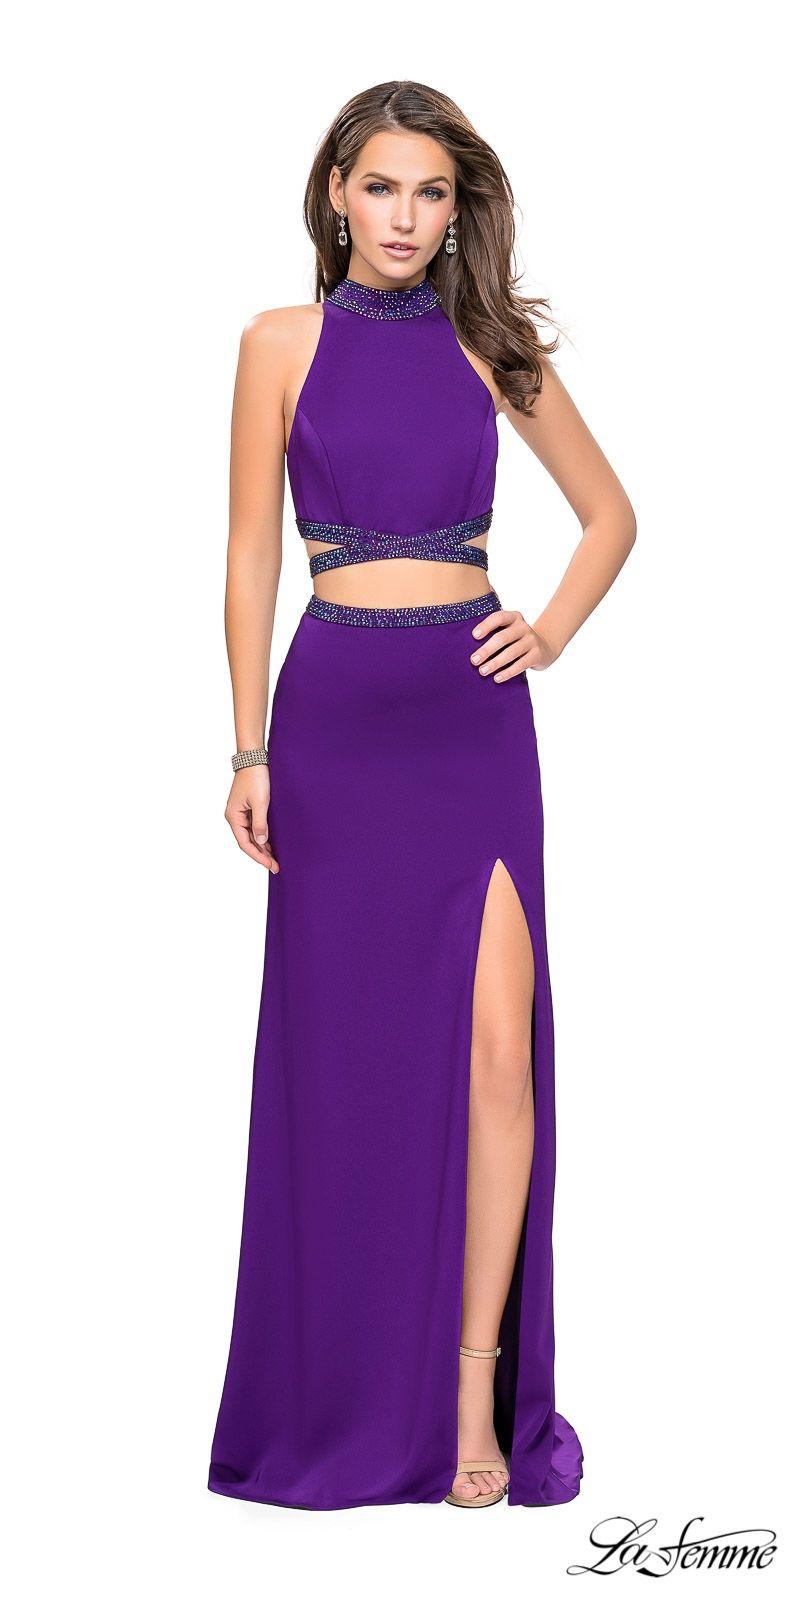 La Femme Two Piece High Neck Beaded Cutout Column Prom Dress